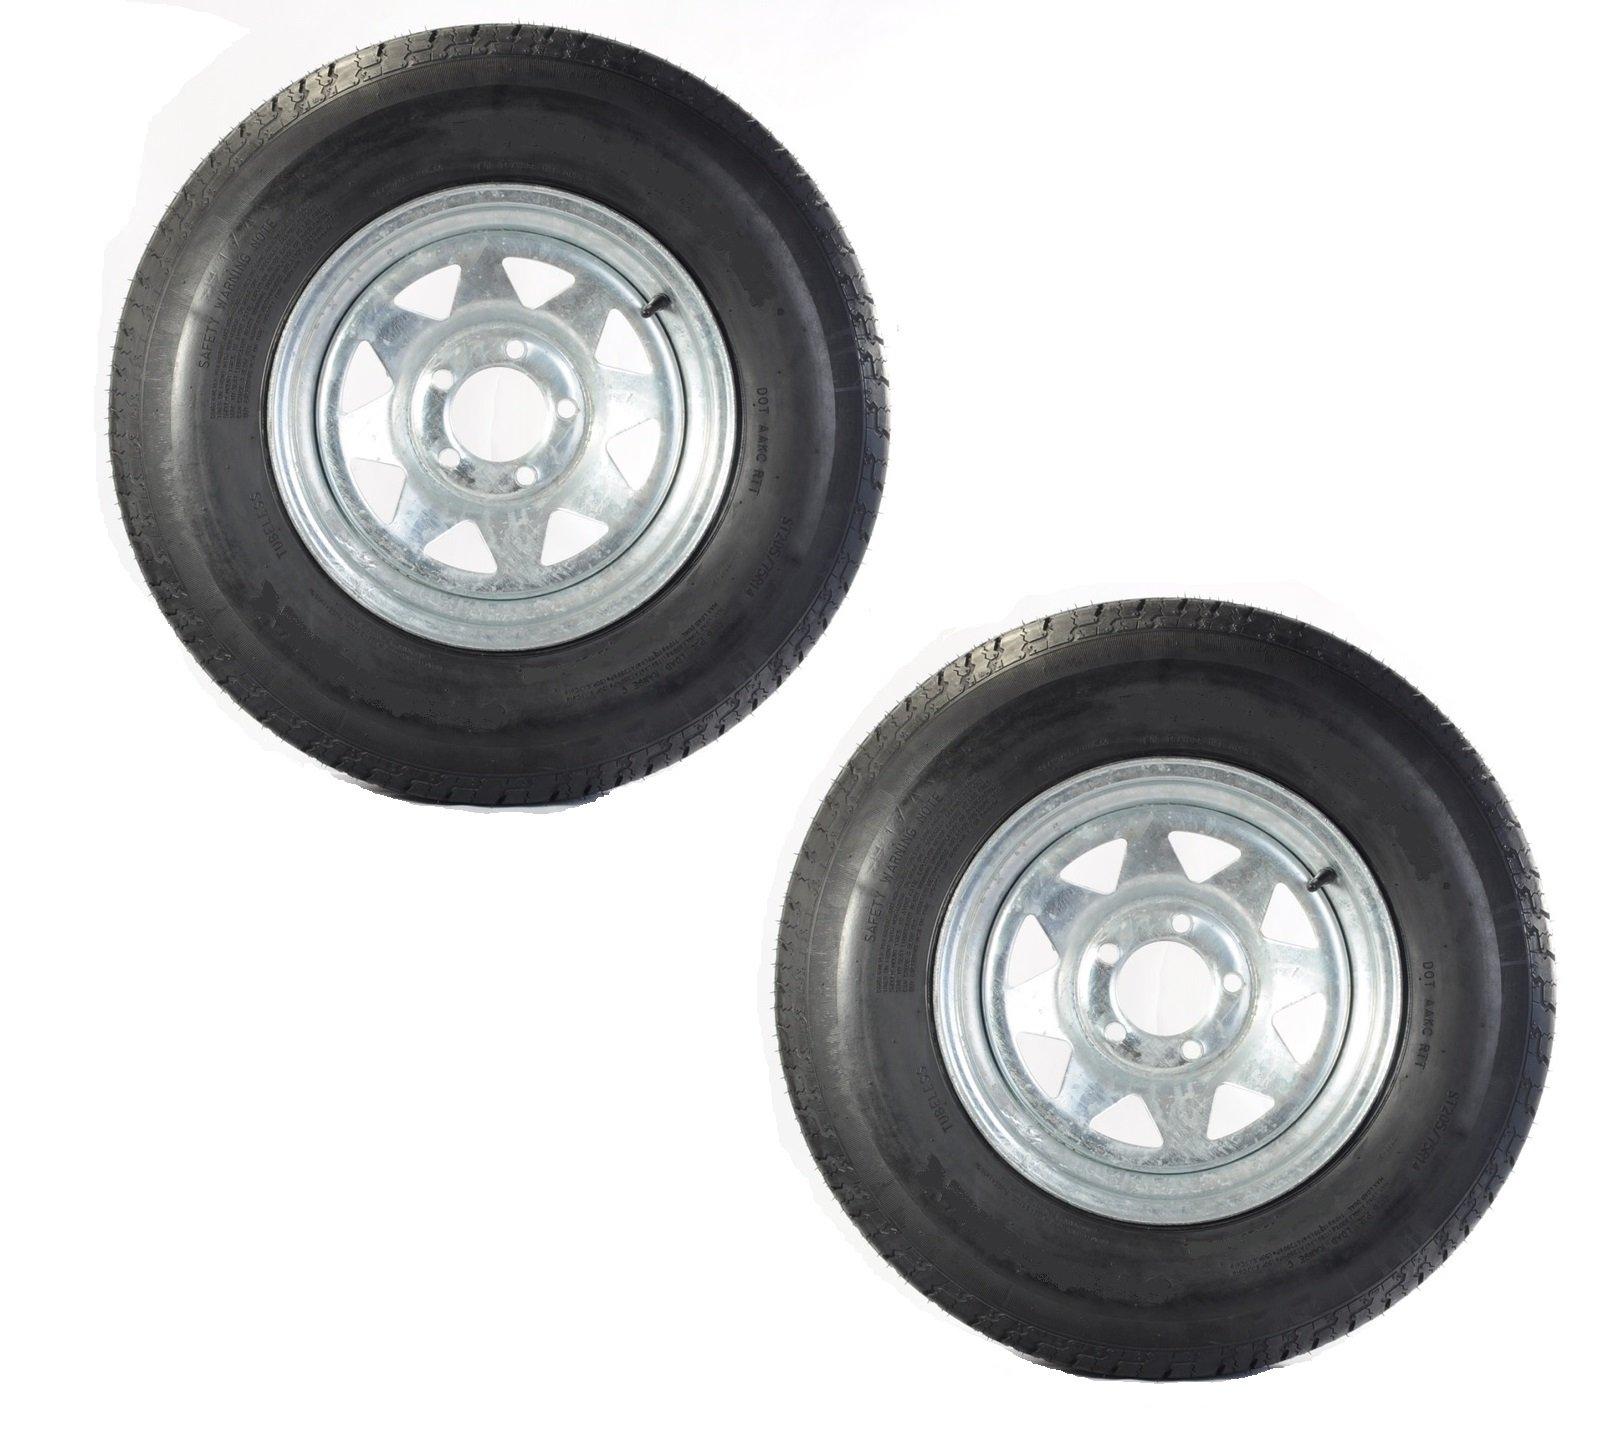 Two Trailer Tires & Rims ST205/75D15 F78-15 205/75-15 15'' 5 Lug Galvanized Spoke